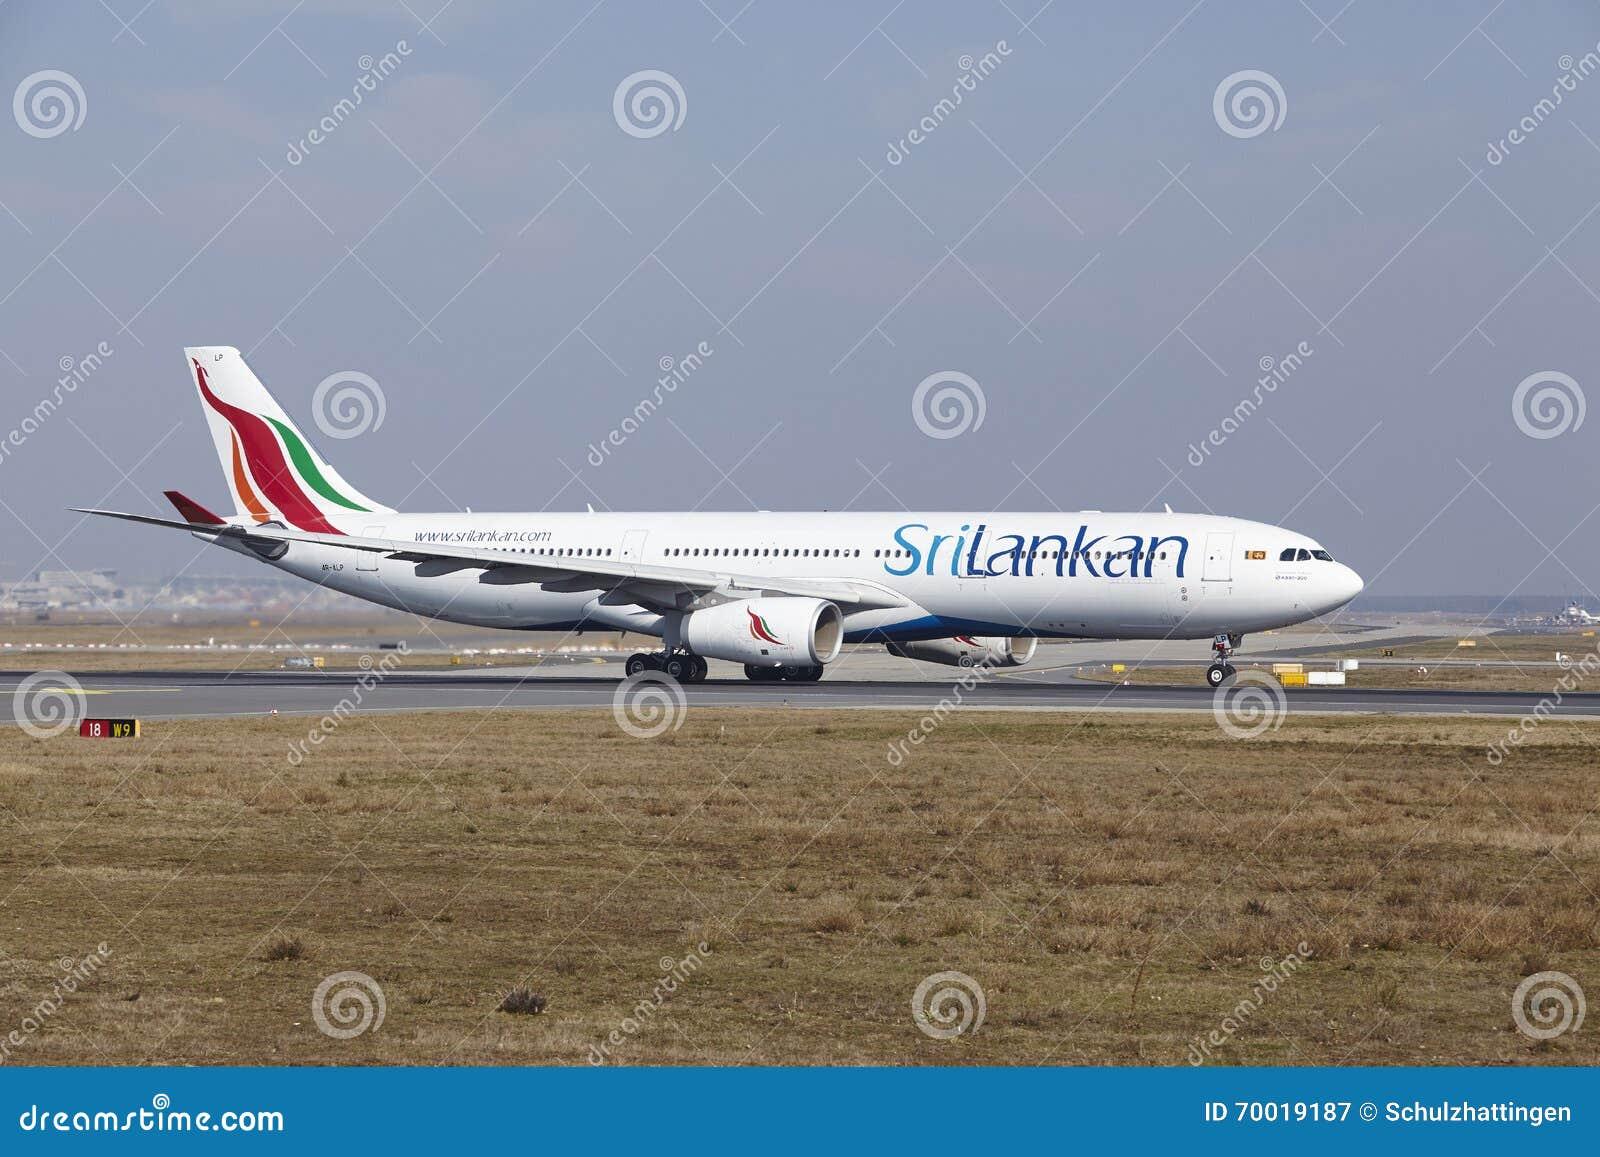 Frankfurt International Airport - SriLankan Airlines Airbus A330 takes off